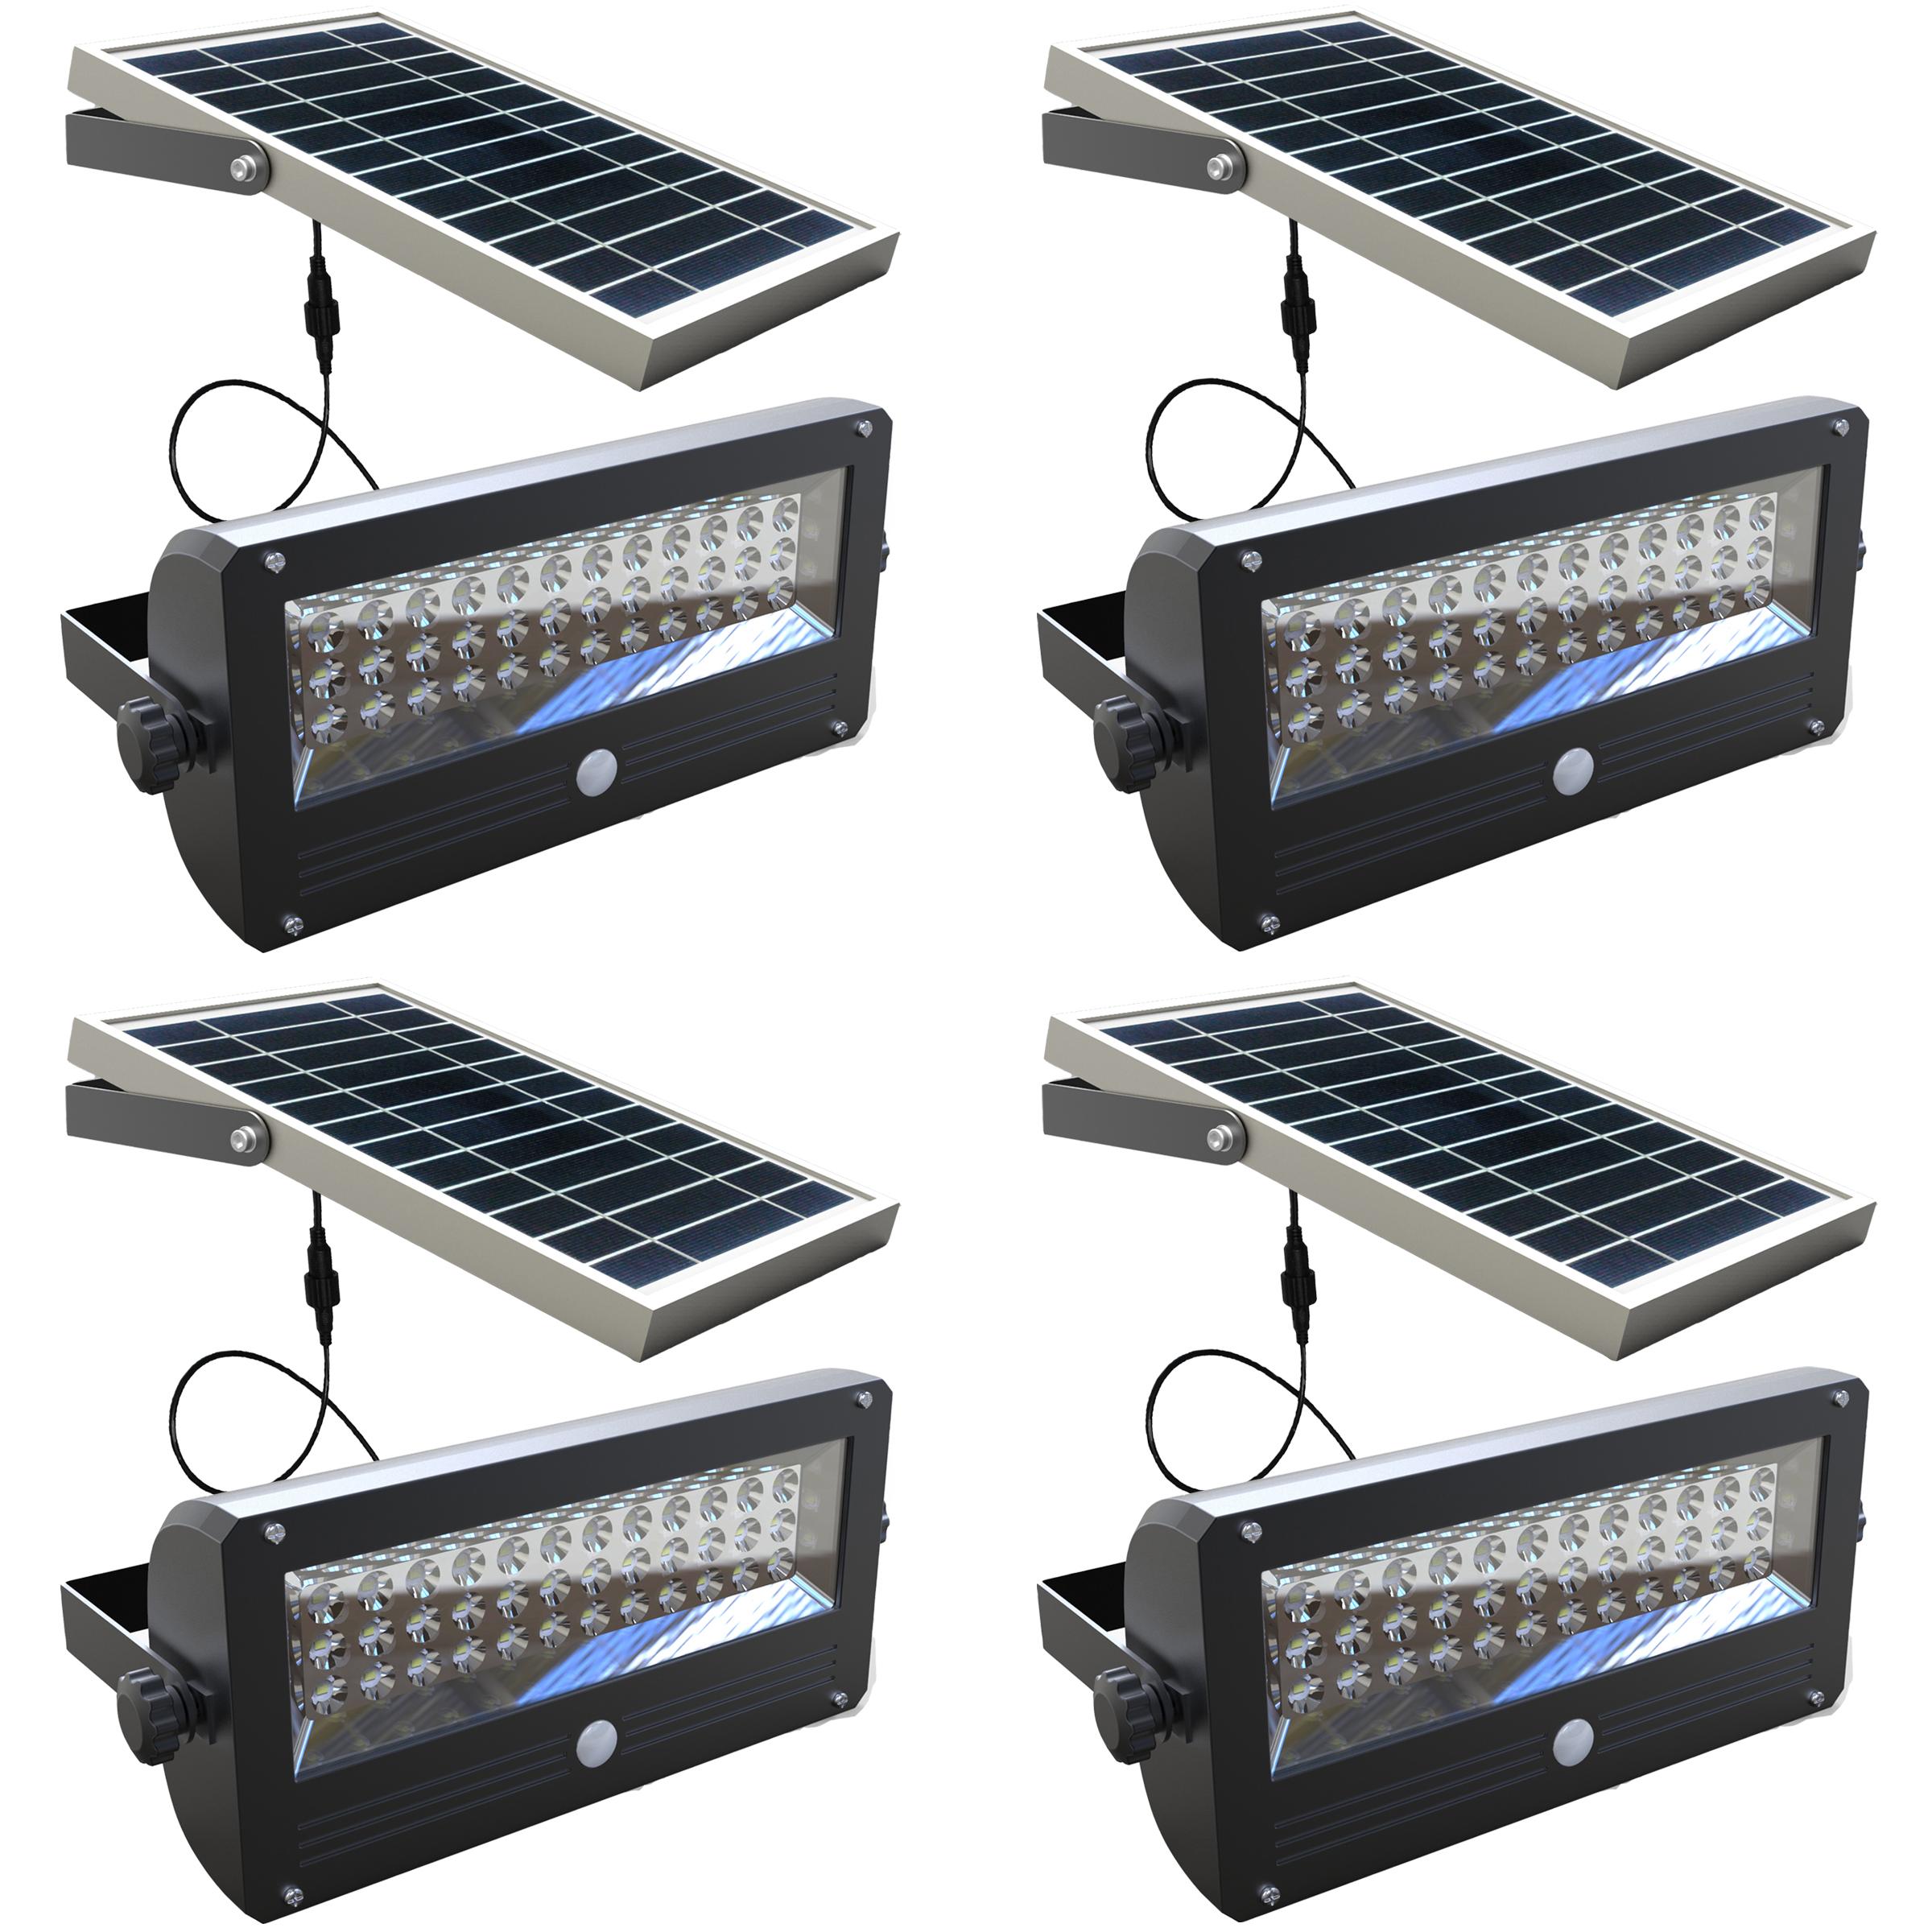 Led Wall Pack Flood Light: 4 Pack 36 LED Solar Outdoor Wall PIR Entrance Motion